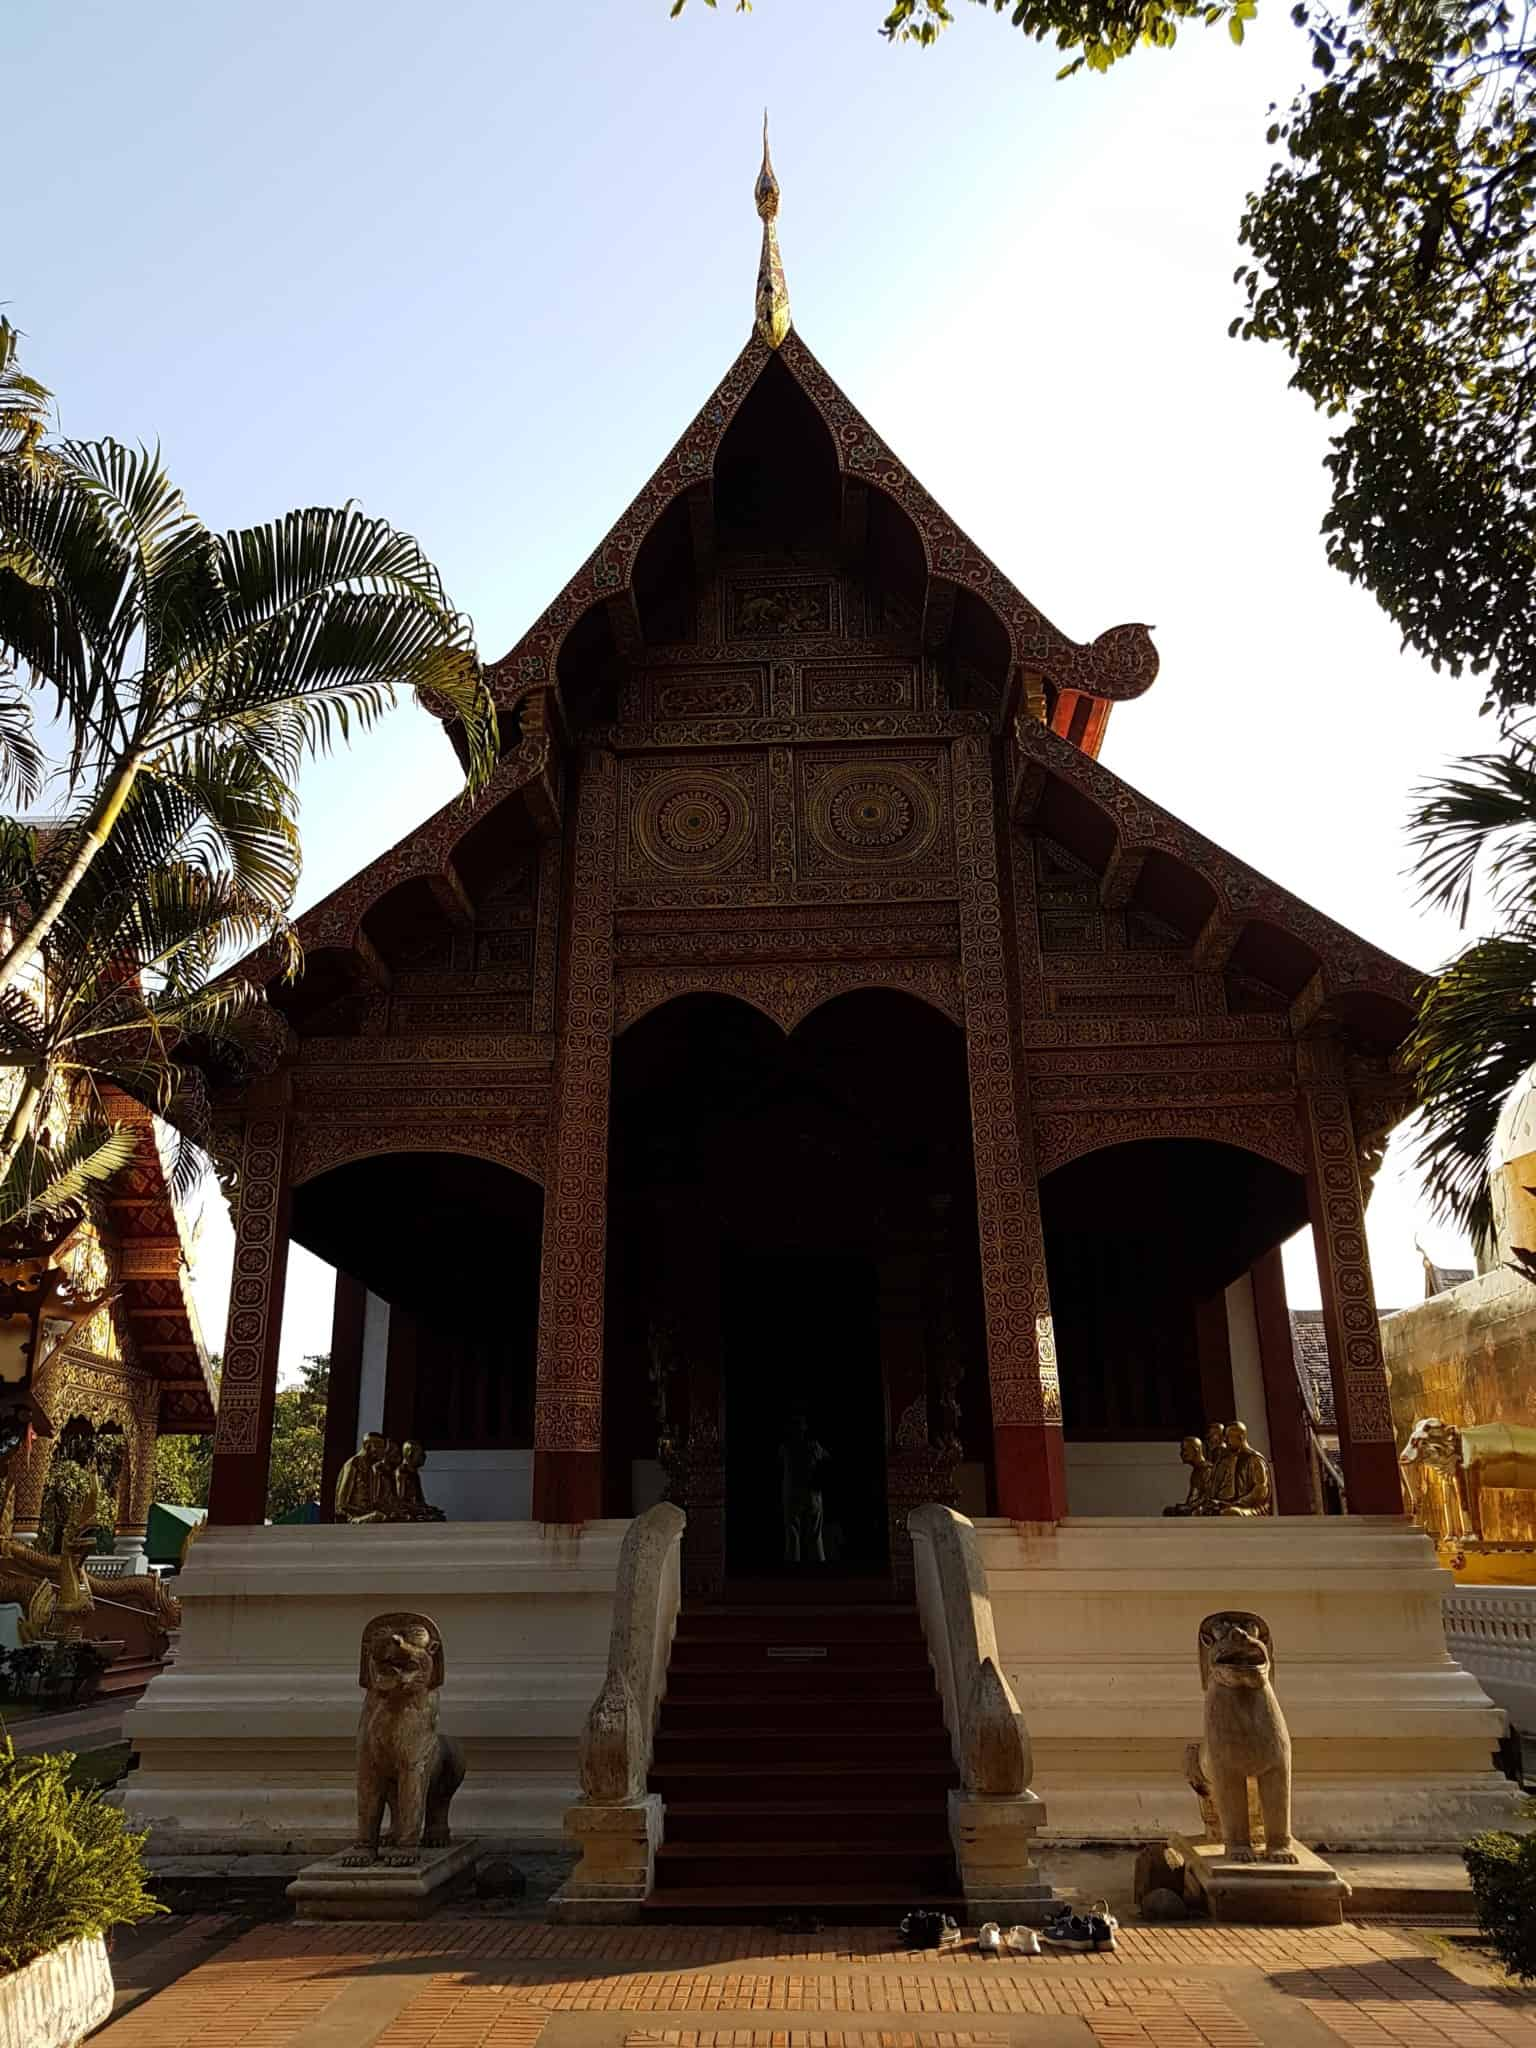 Thaïlande, on continue d'explorer Chiang Mai 👟 8